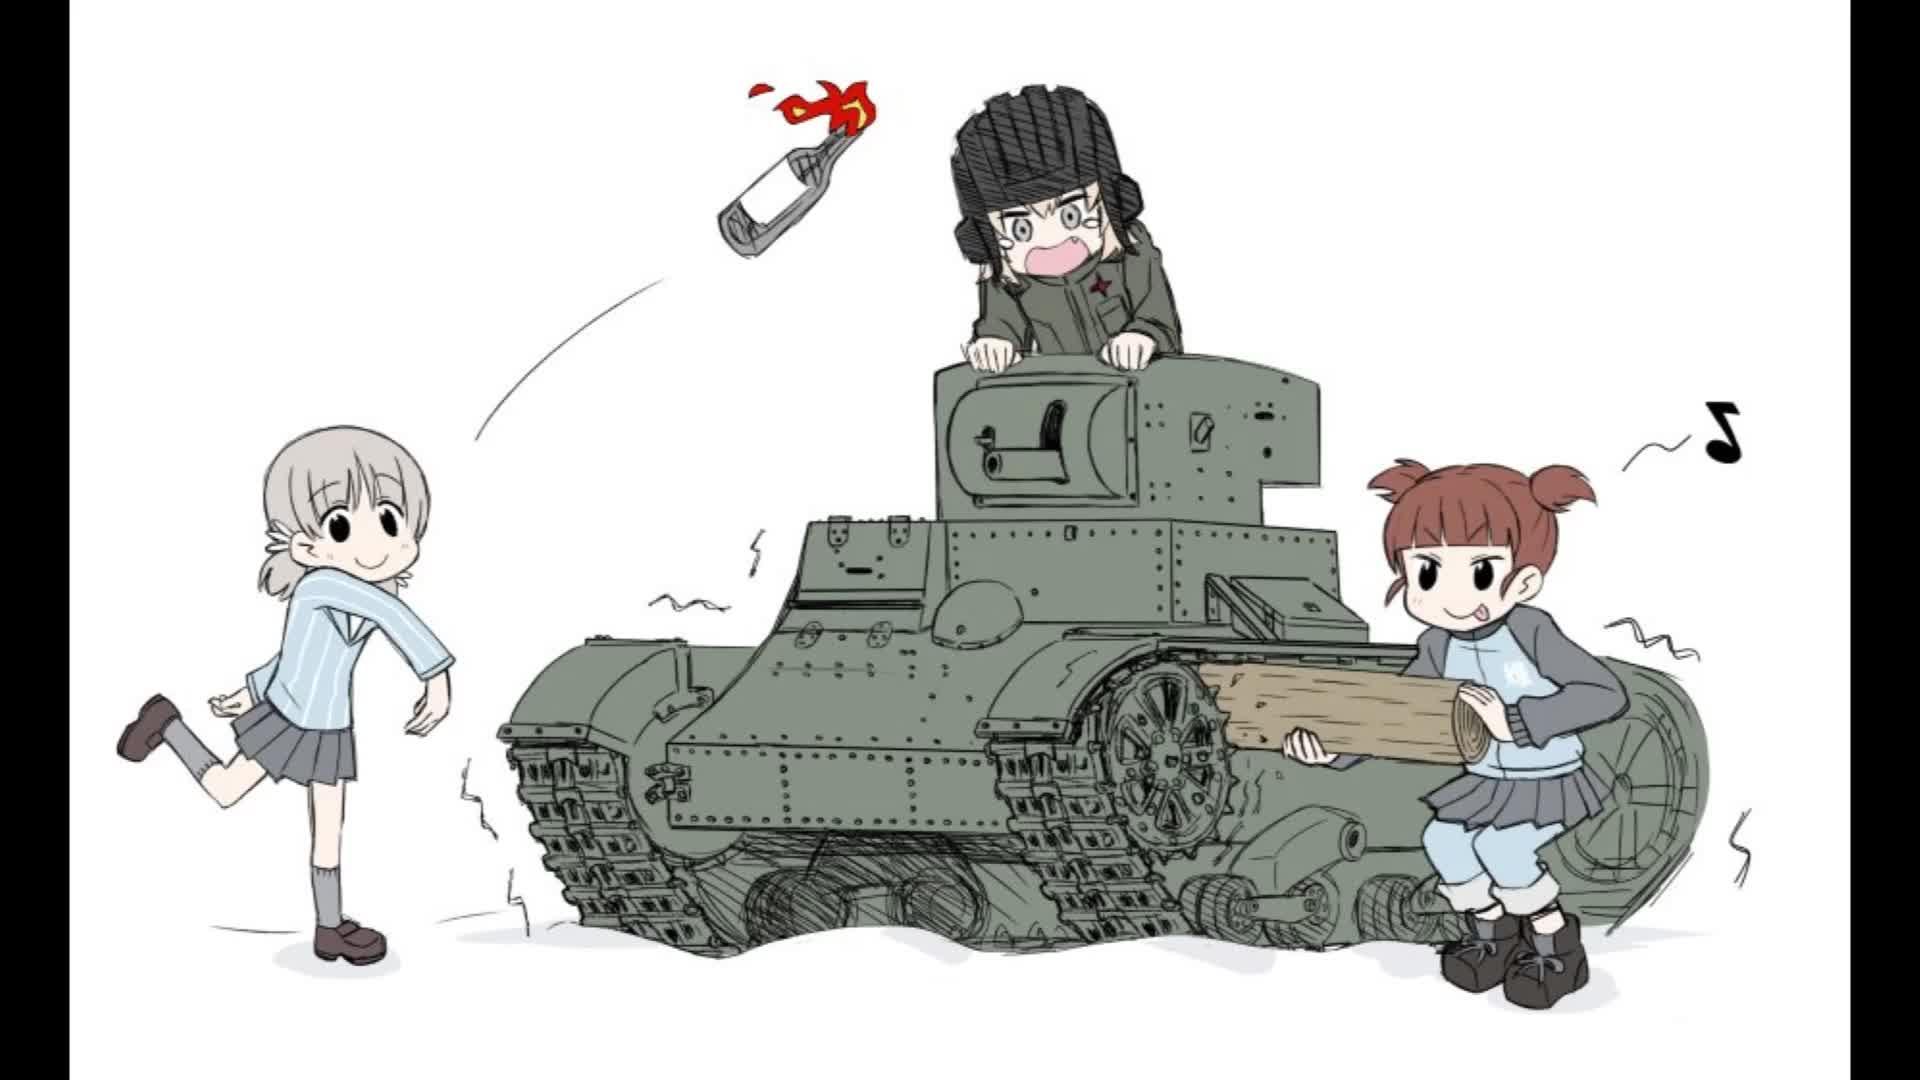 Girls und Panzer Comp: Njet Katyusha. Source on the song Windows 10 Photo edit is trash Previous GuP Comps. sublimeslimetime poundbuttz ironstorm nexeh zealotgold jurrigaani